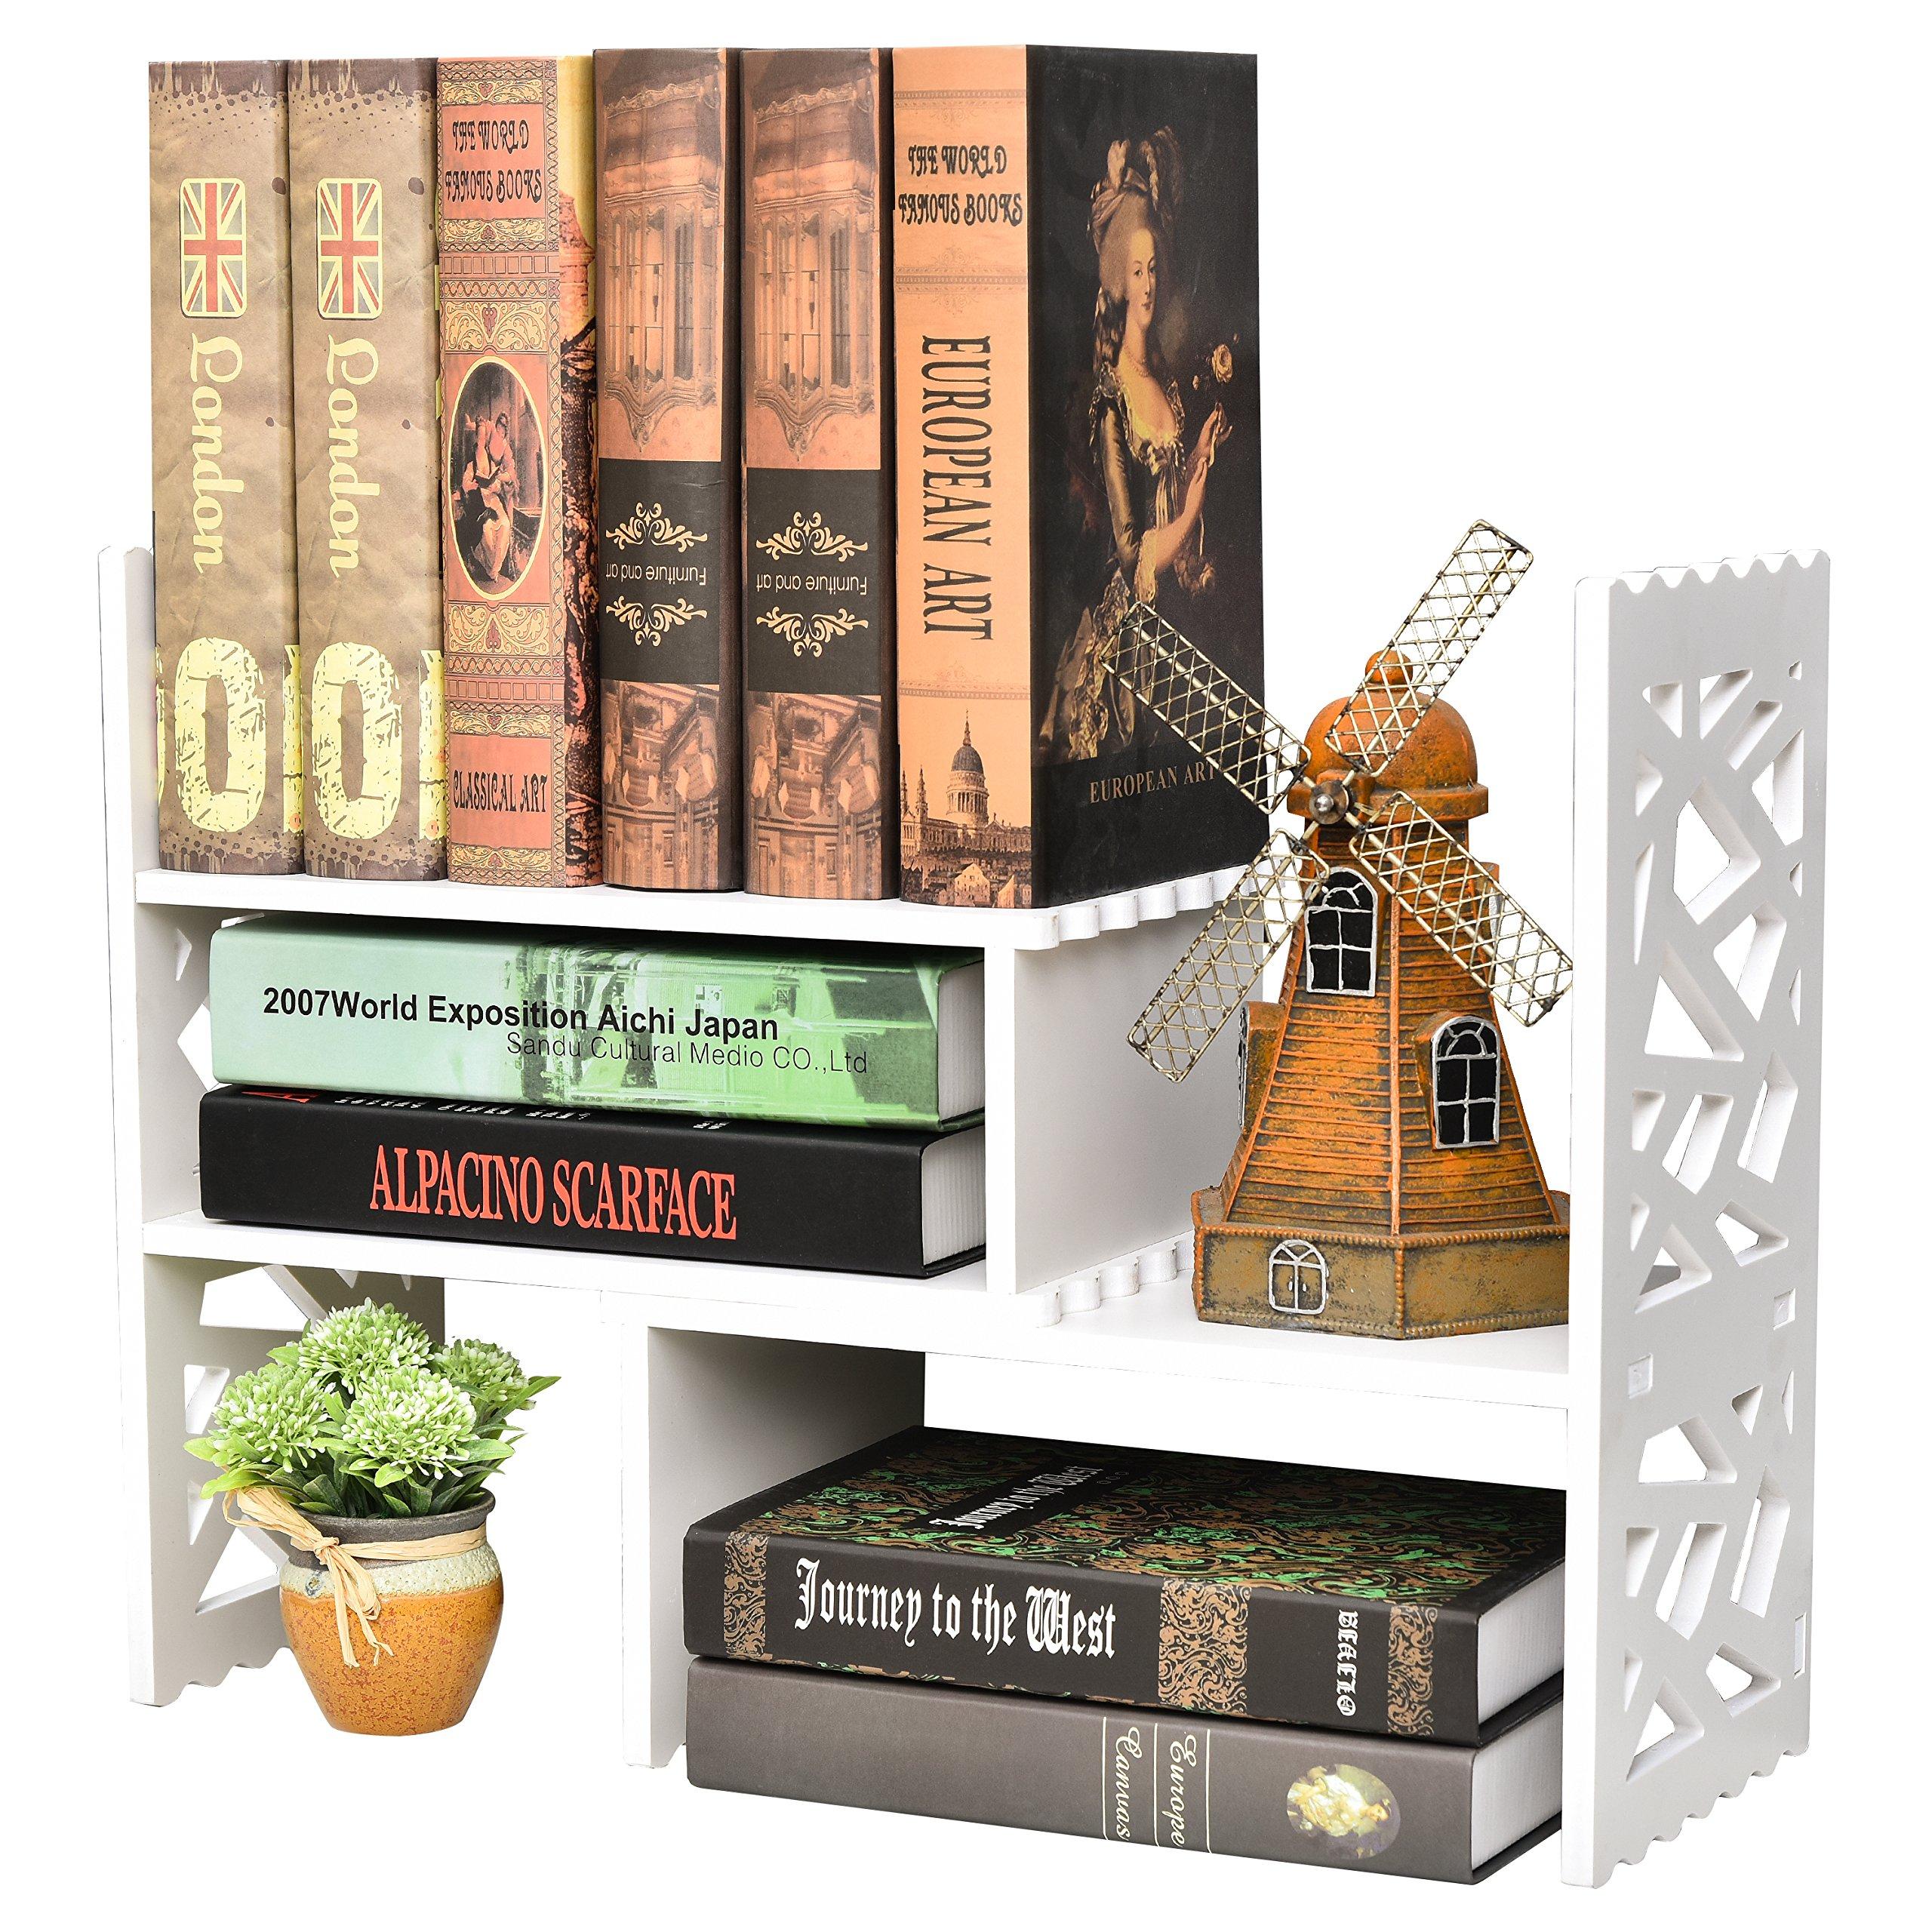 Expandable Openwork Desktop Bookshelf Organizer, Shelving Unit, White Matte Finish